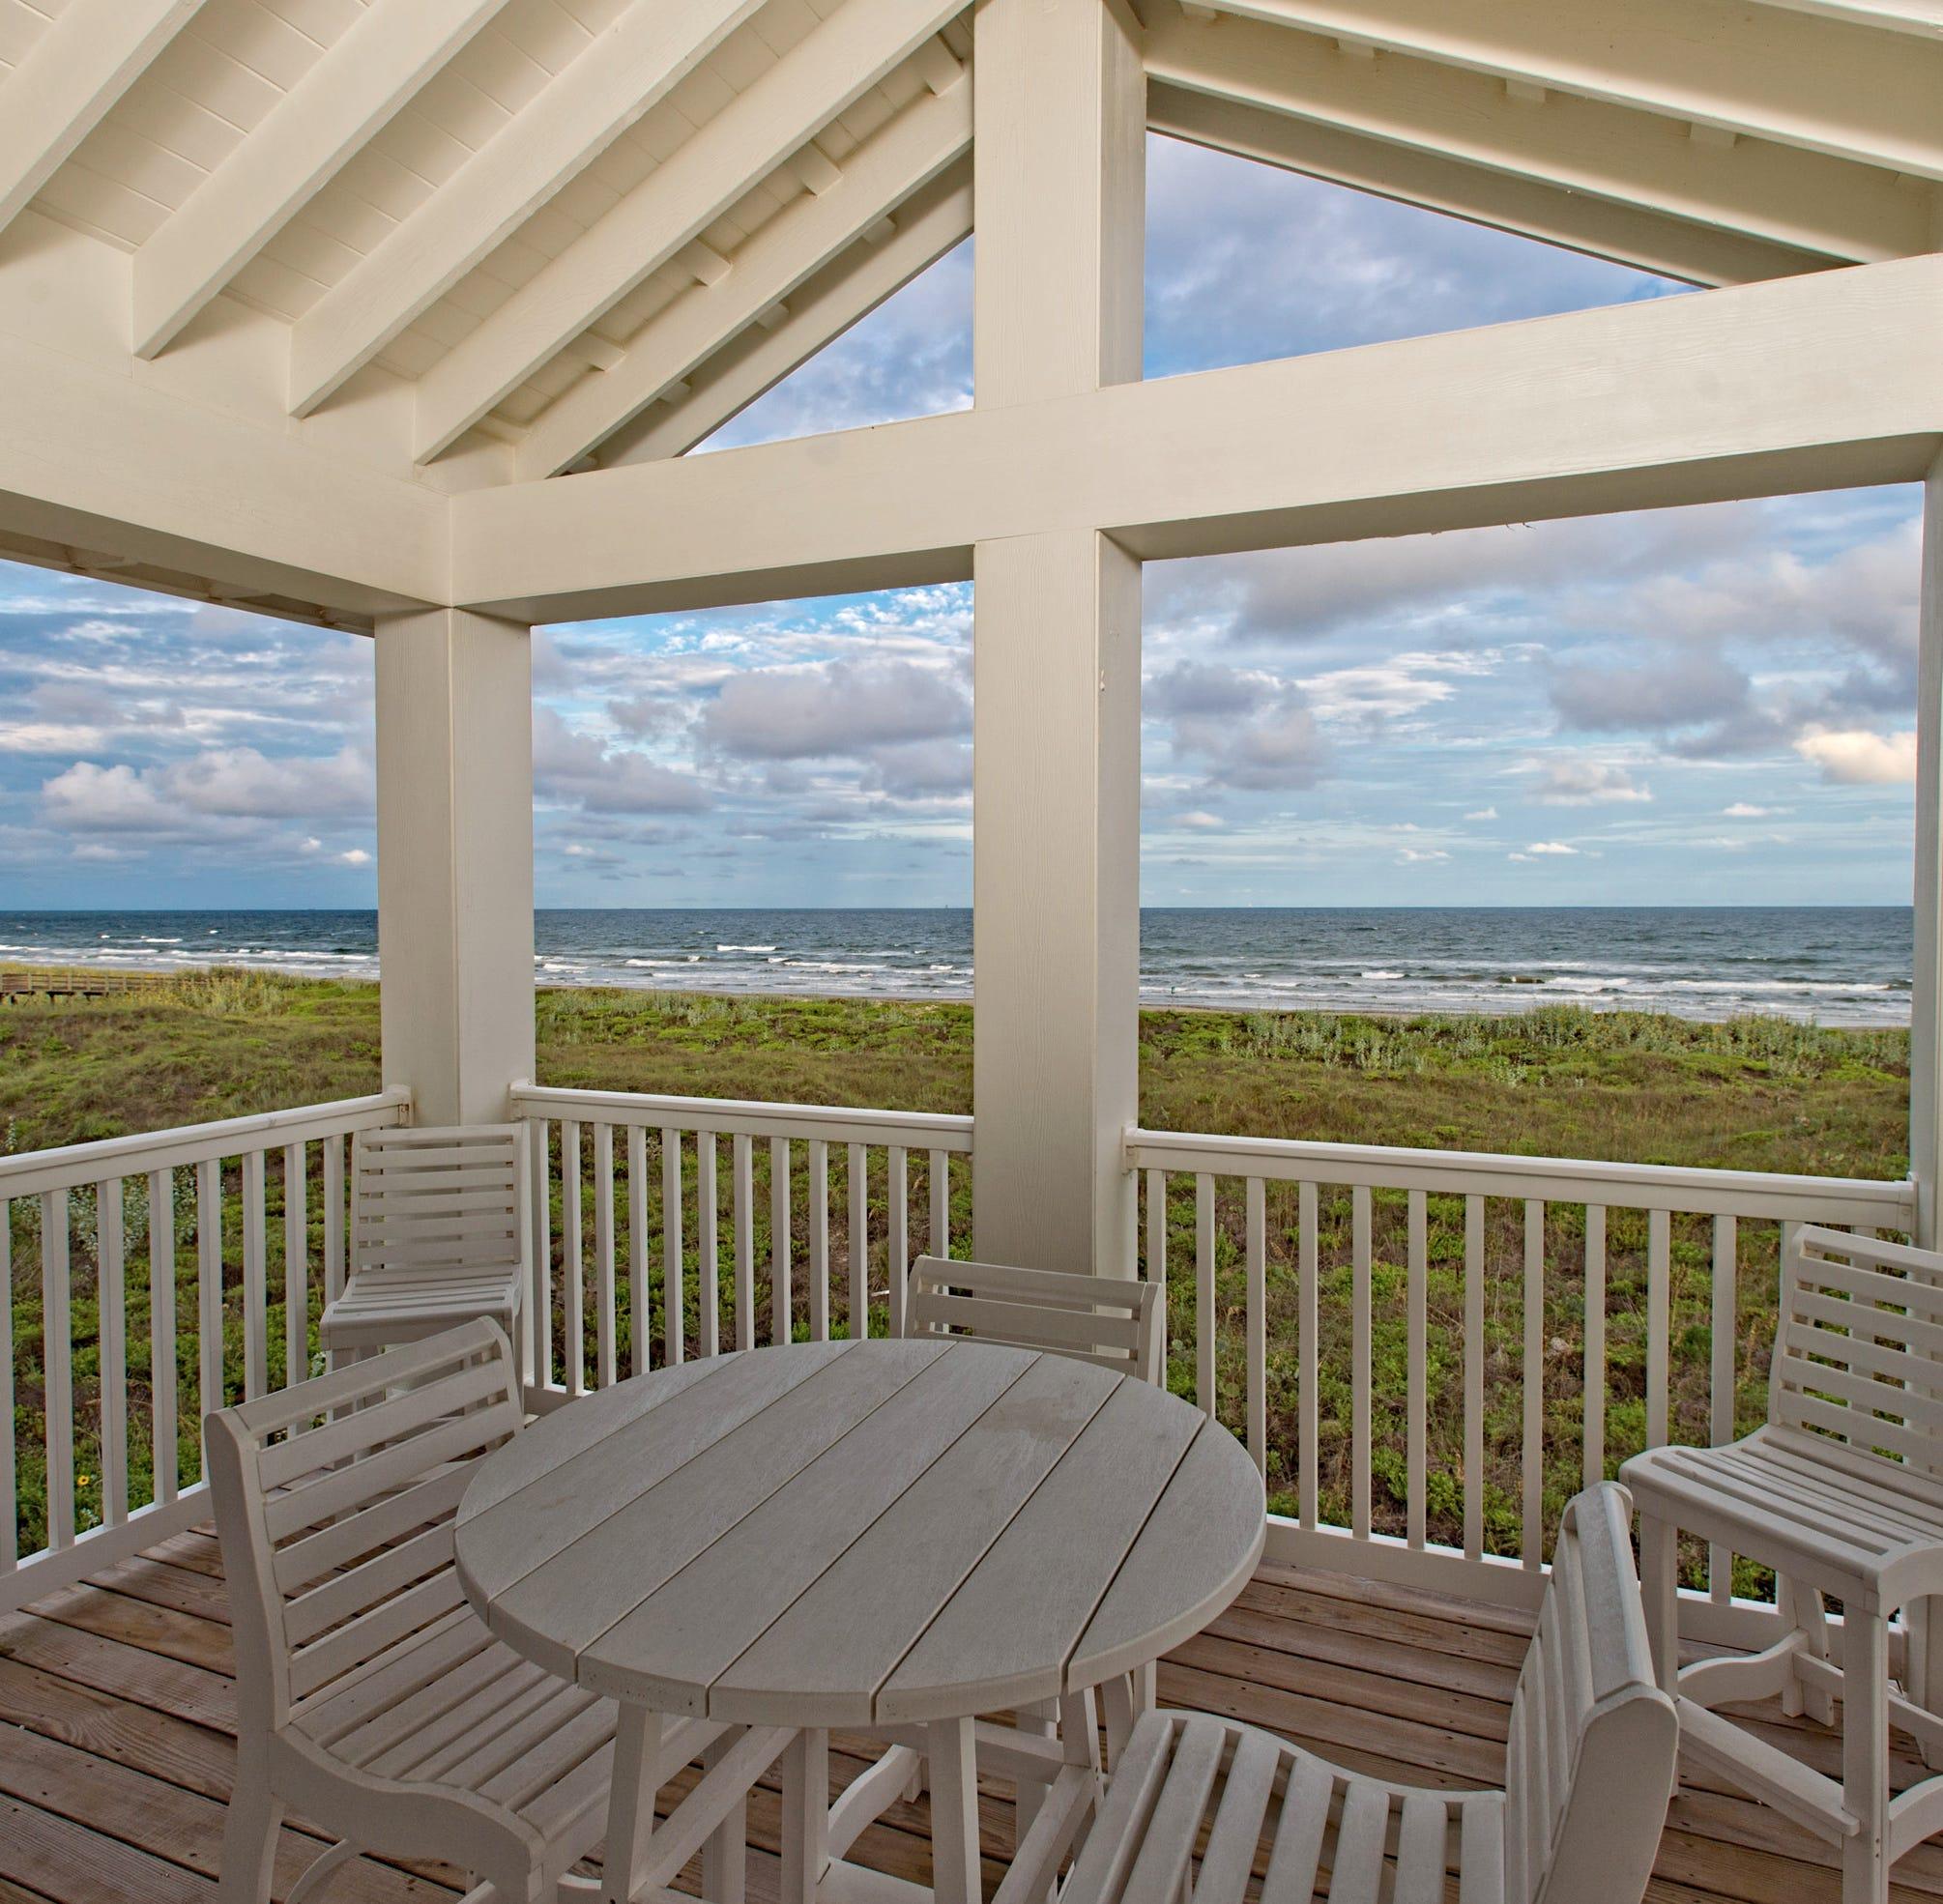 Sunday Homes: Seaside Drive in Cinnamon Shore